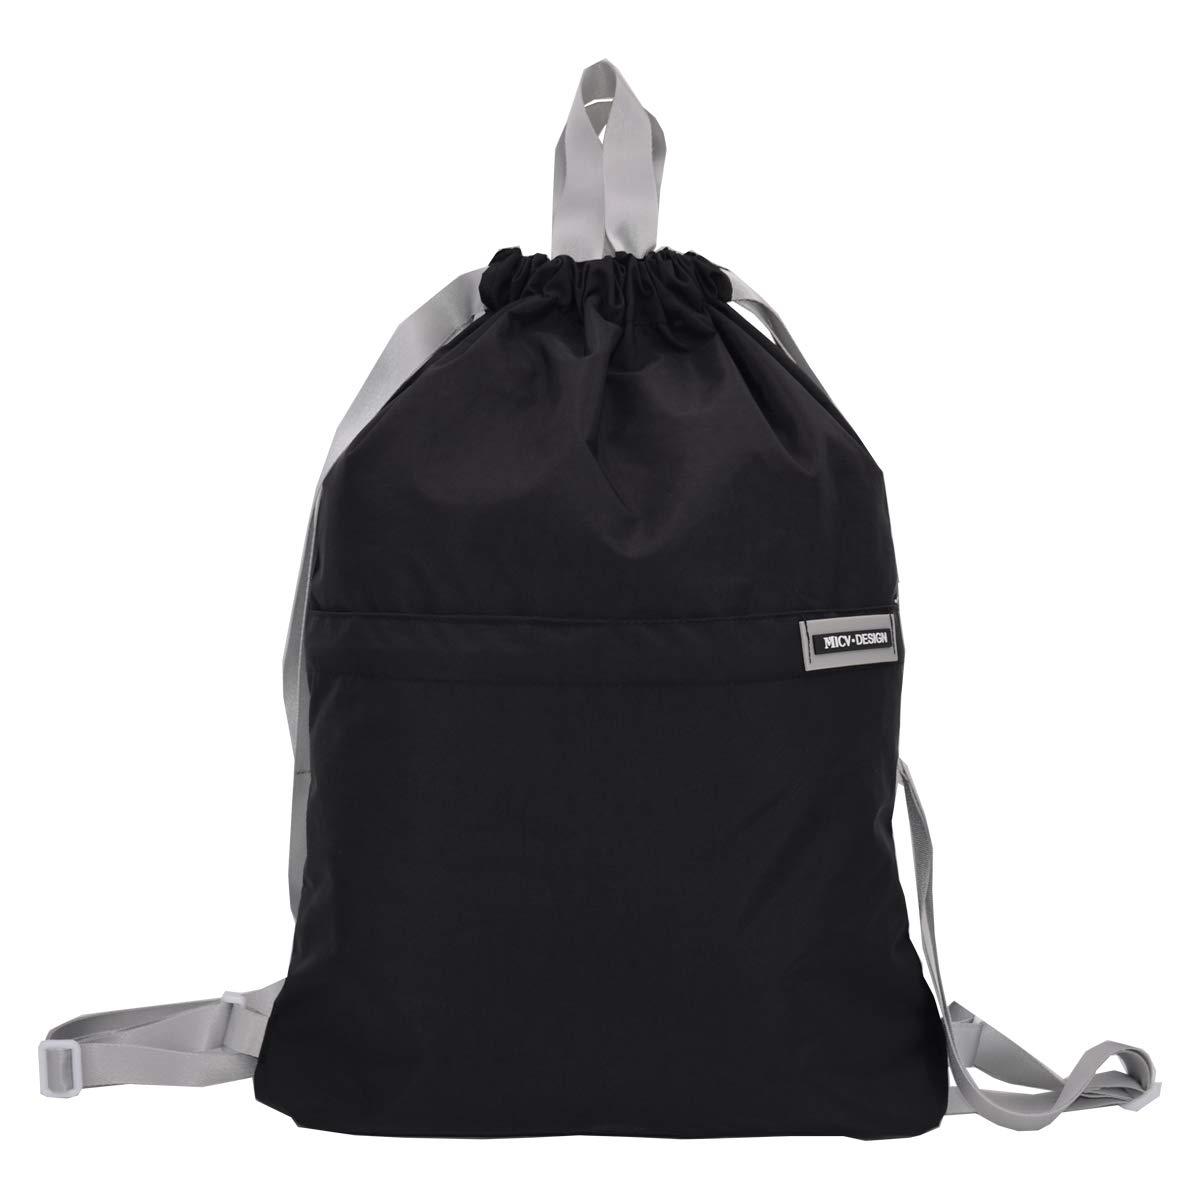 MICV Drawstring Backpack Sport Bag - Sack Back Bag Sports Waterproof Gym Backpack(17.3 x 14.2 in,Black)